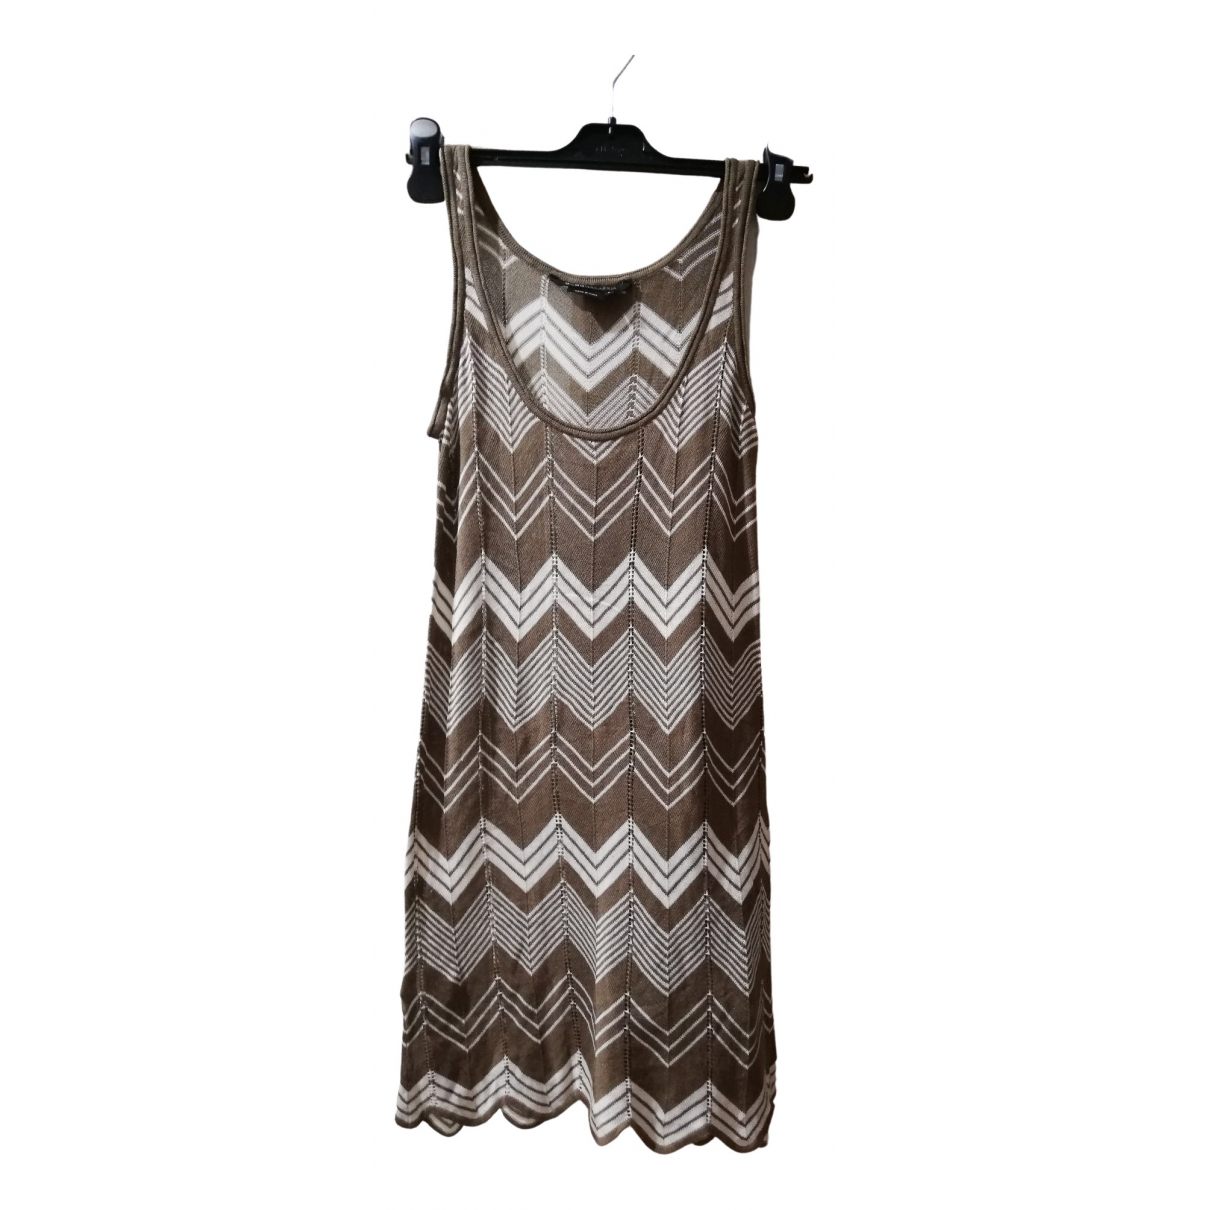 Bcbg Max Azria N Multicolour Silk dress for Women S International